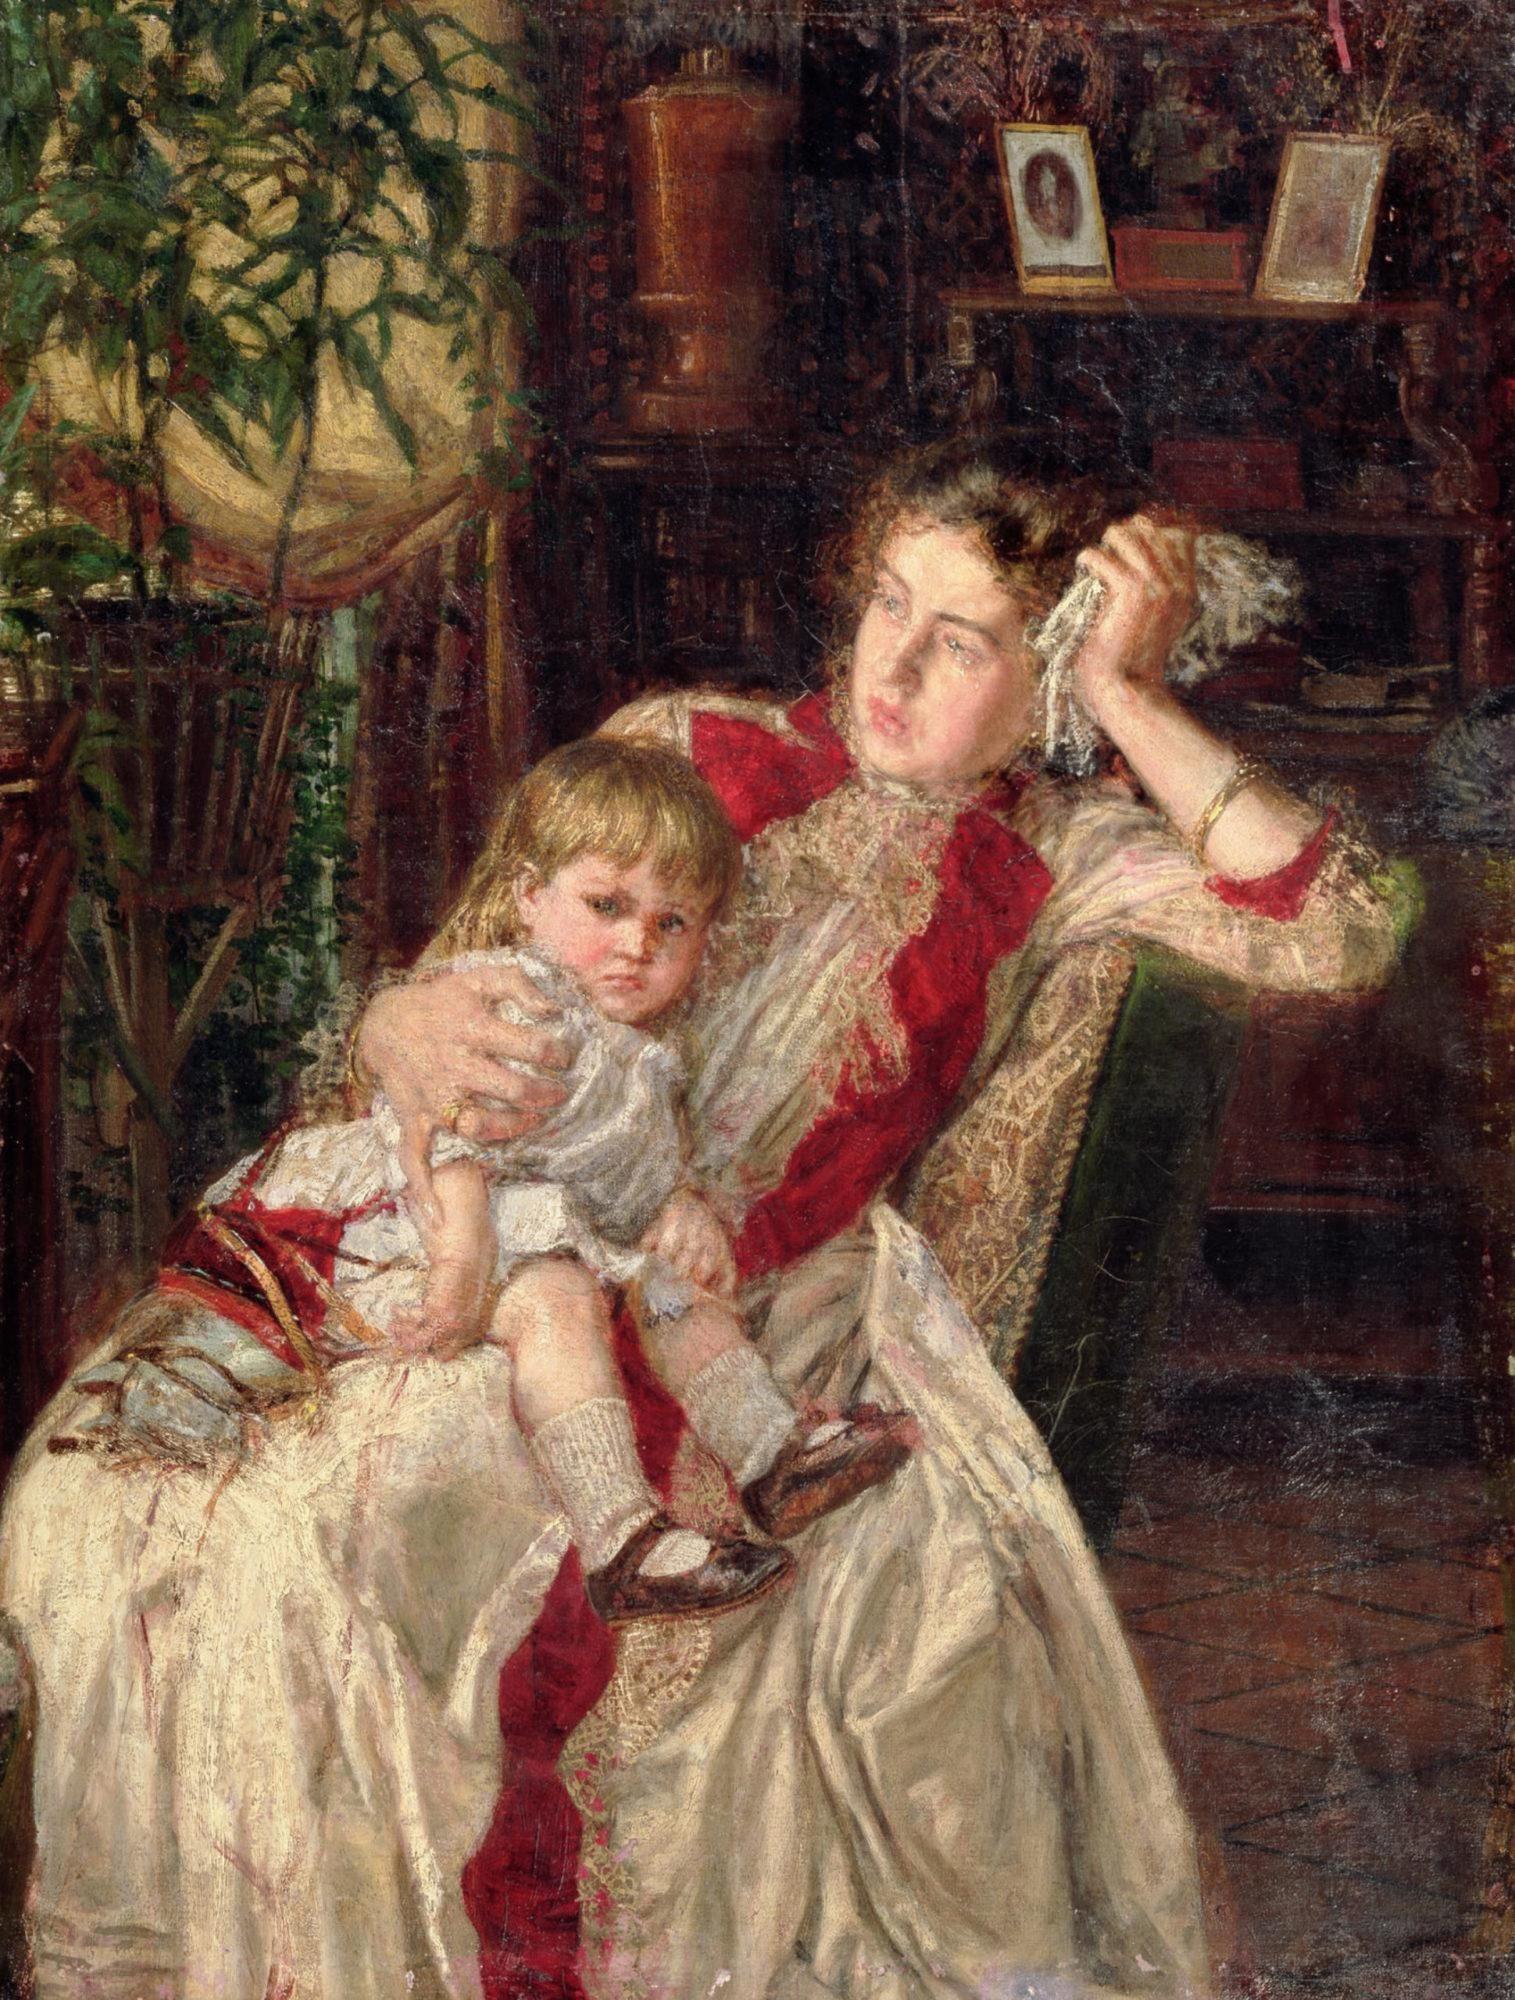 Константин Савицкий, 1890 год, картина «Семейная ссора».